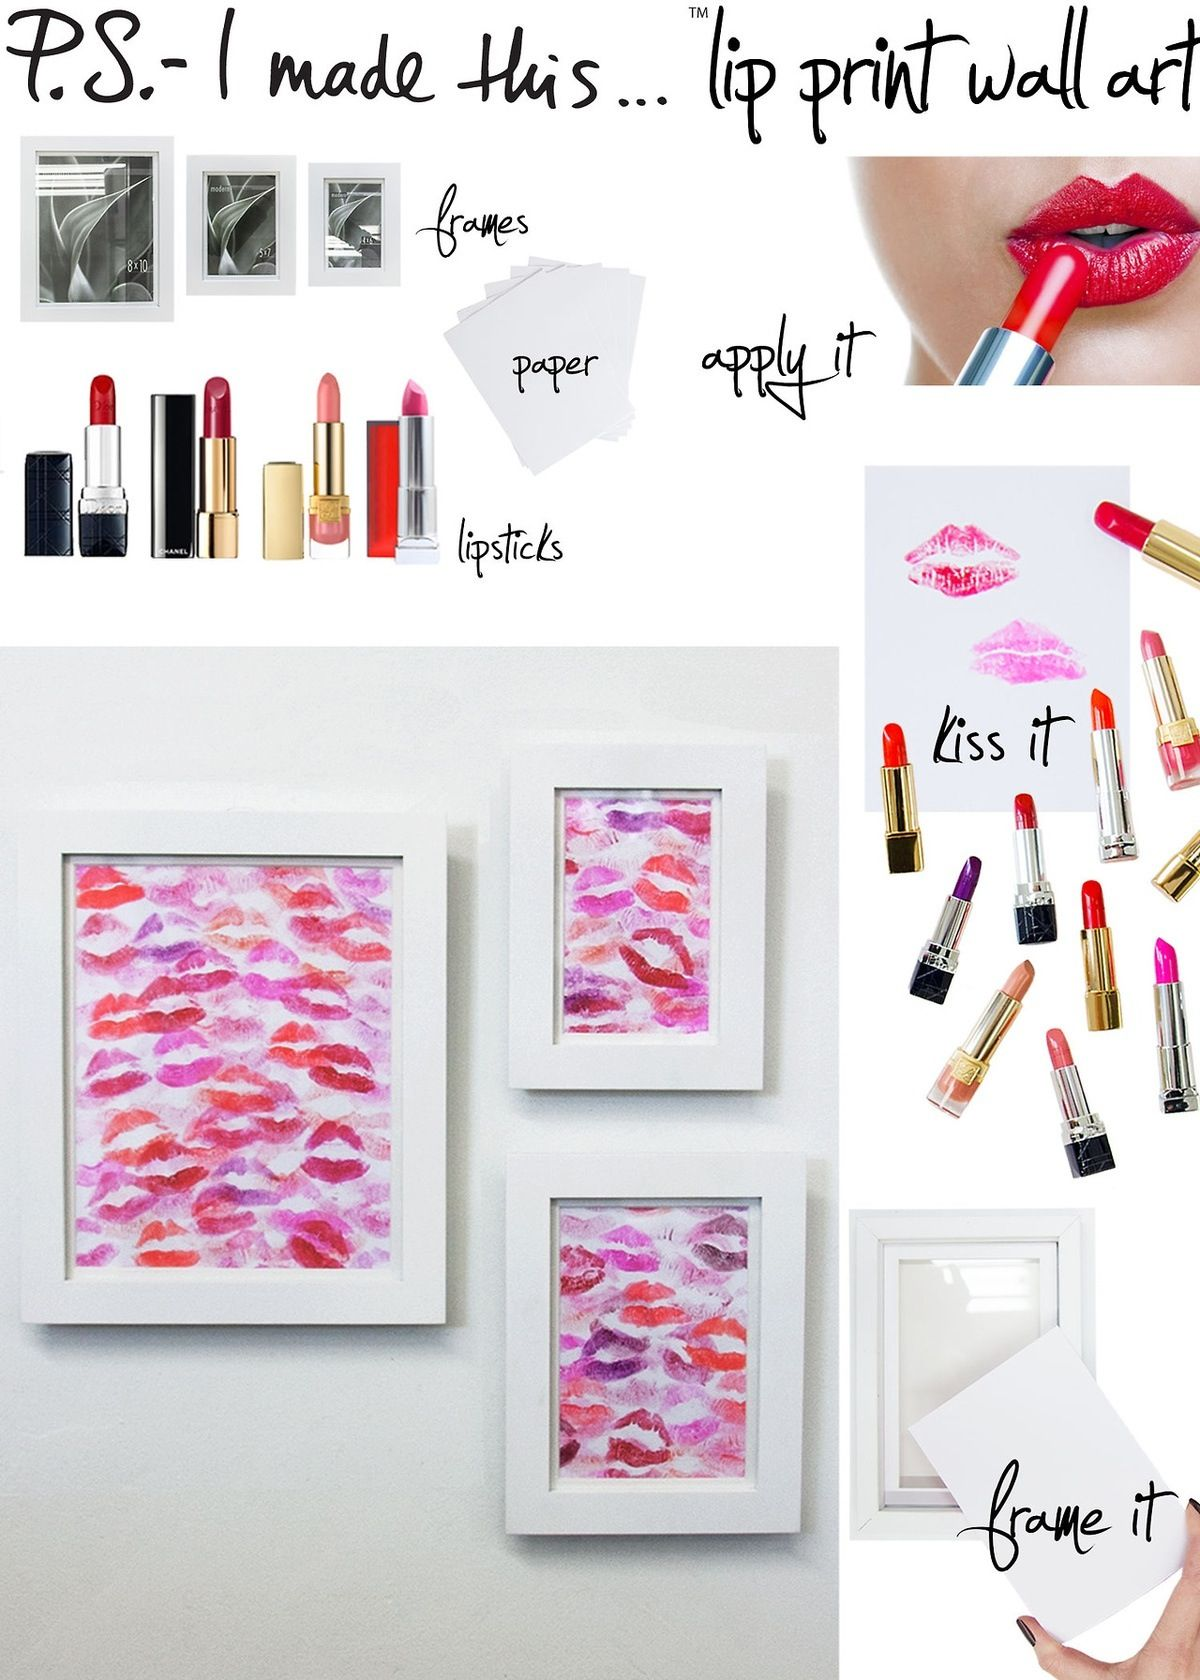 Diy Lip Print Wall Art With Lipsticks In Any Redish